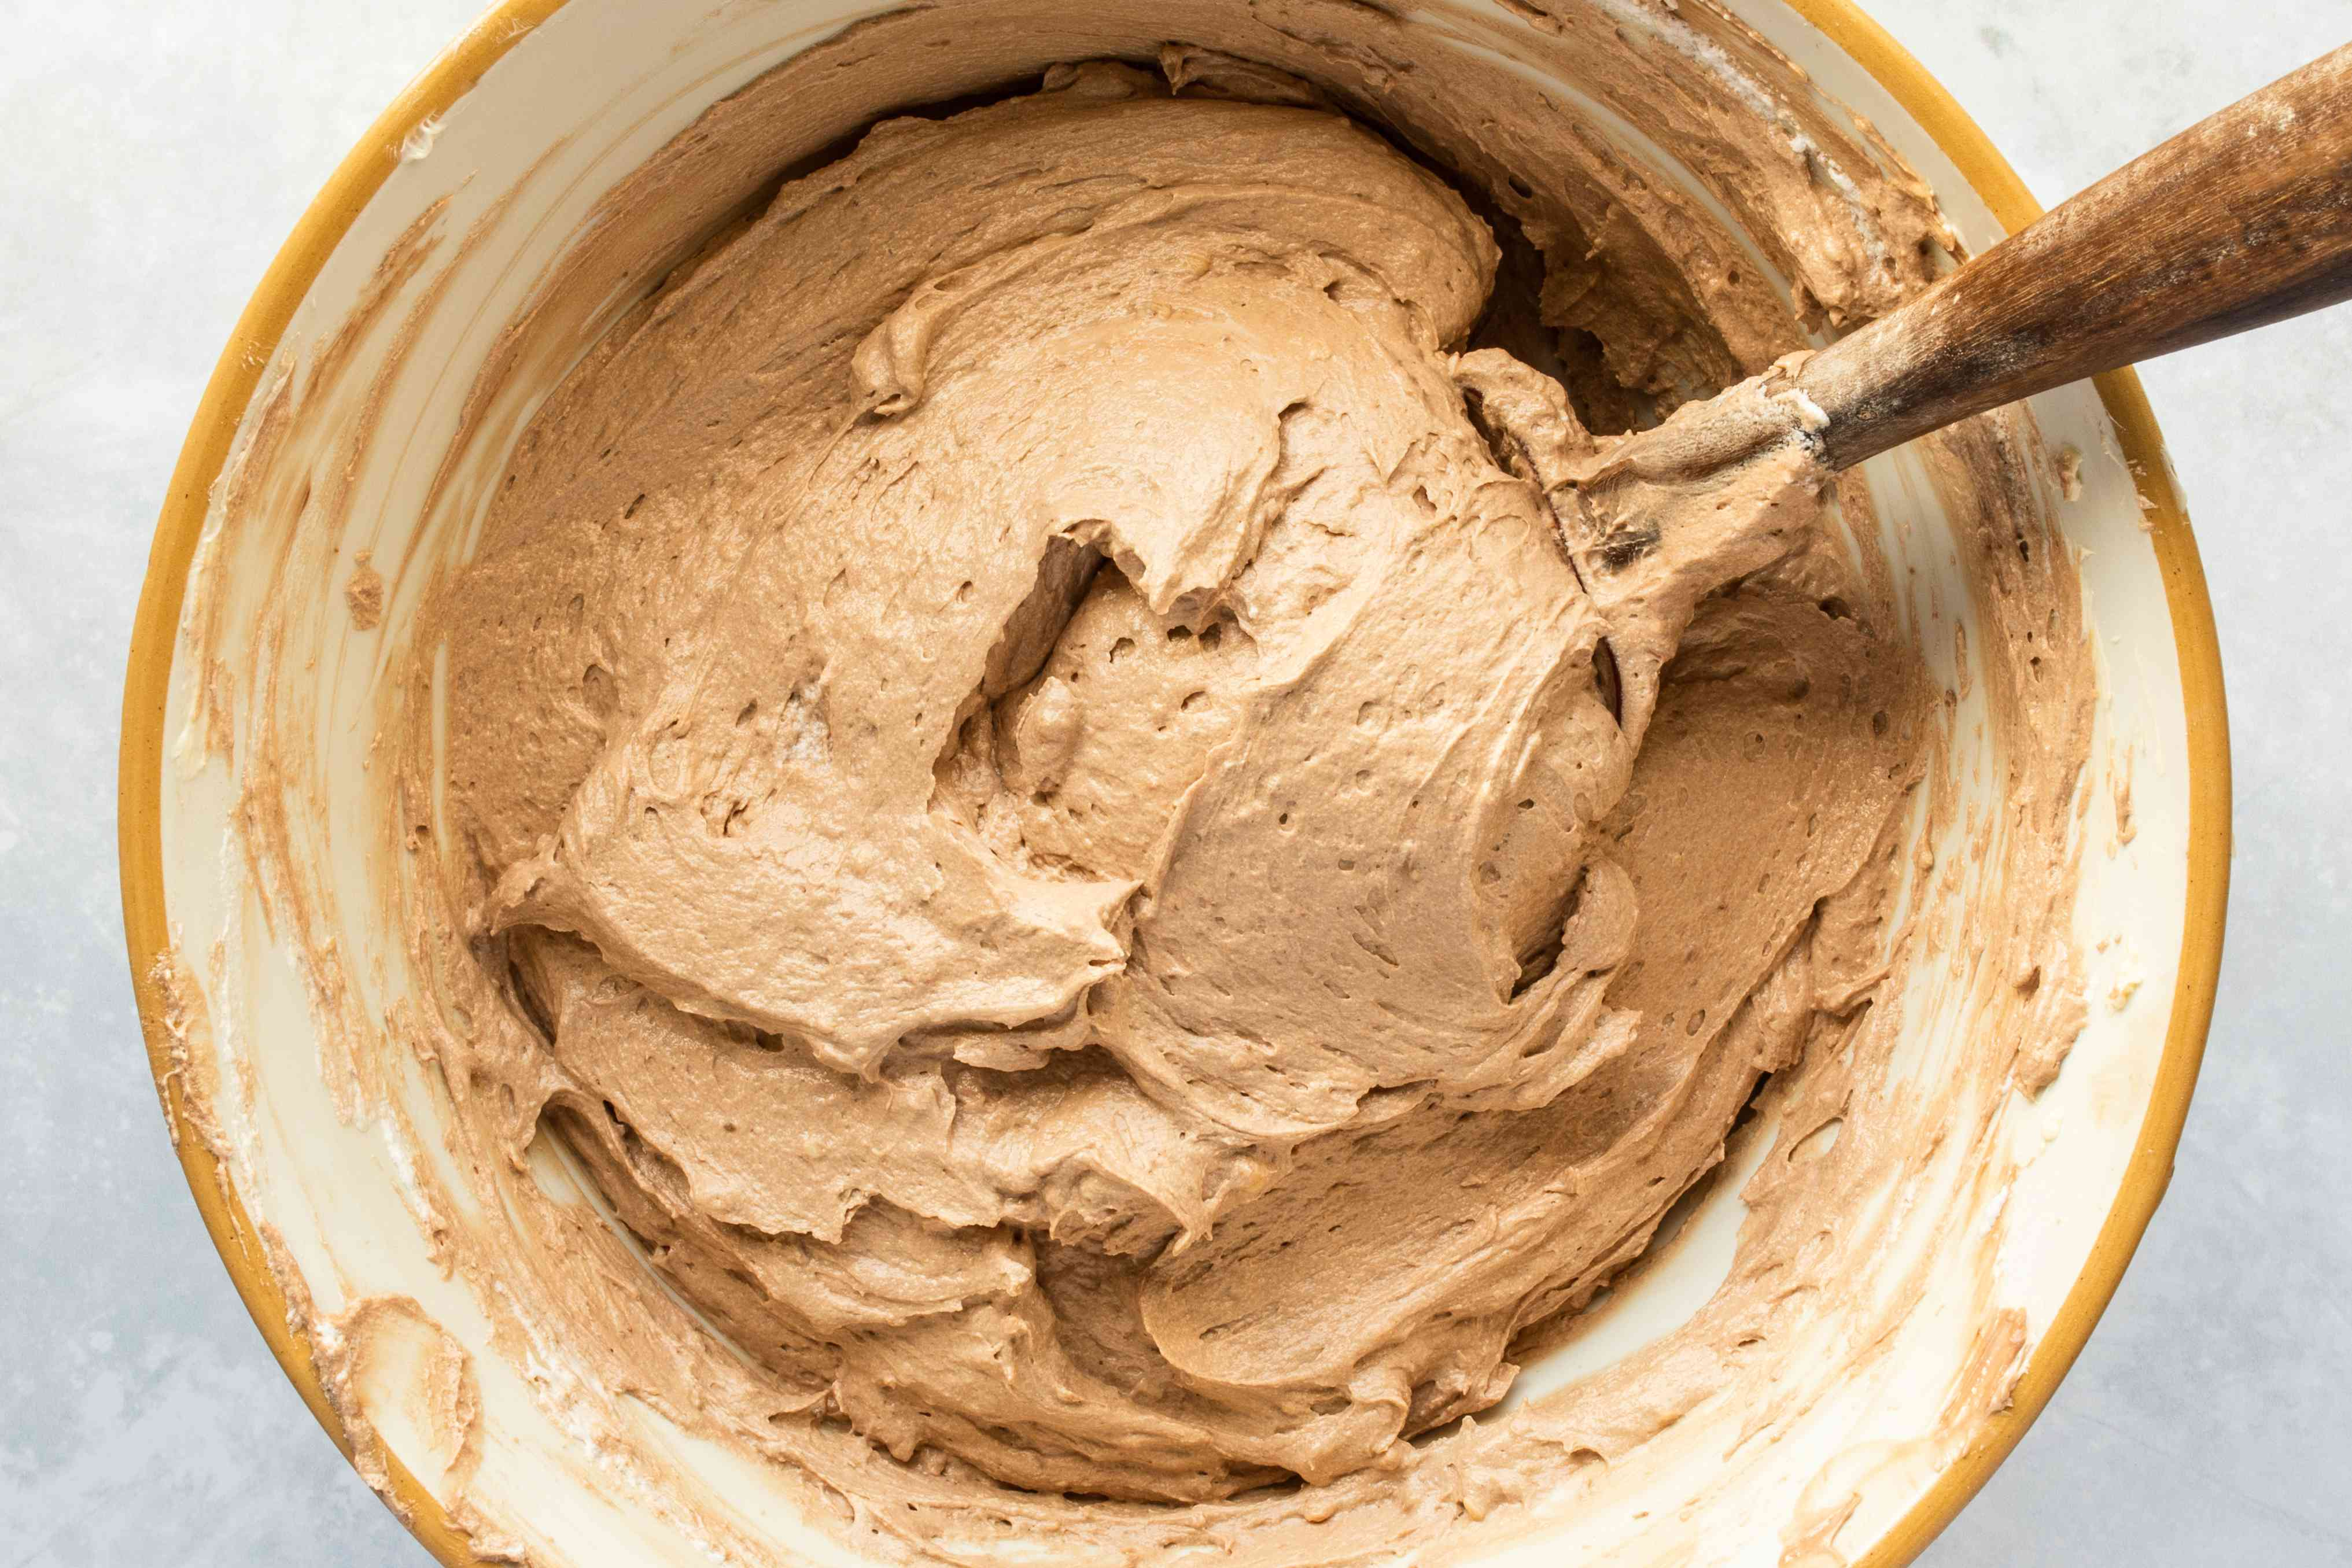 Chocolate buttercream in a bowl